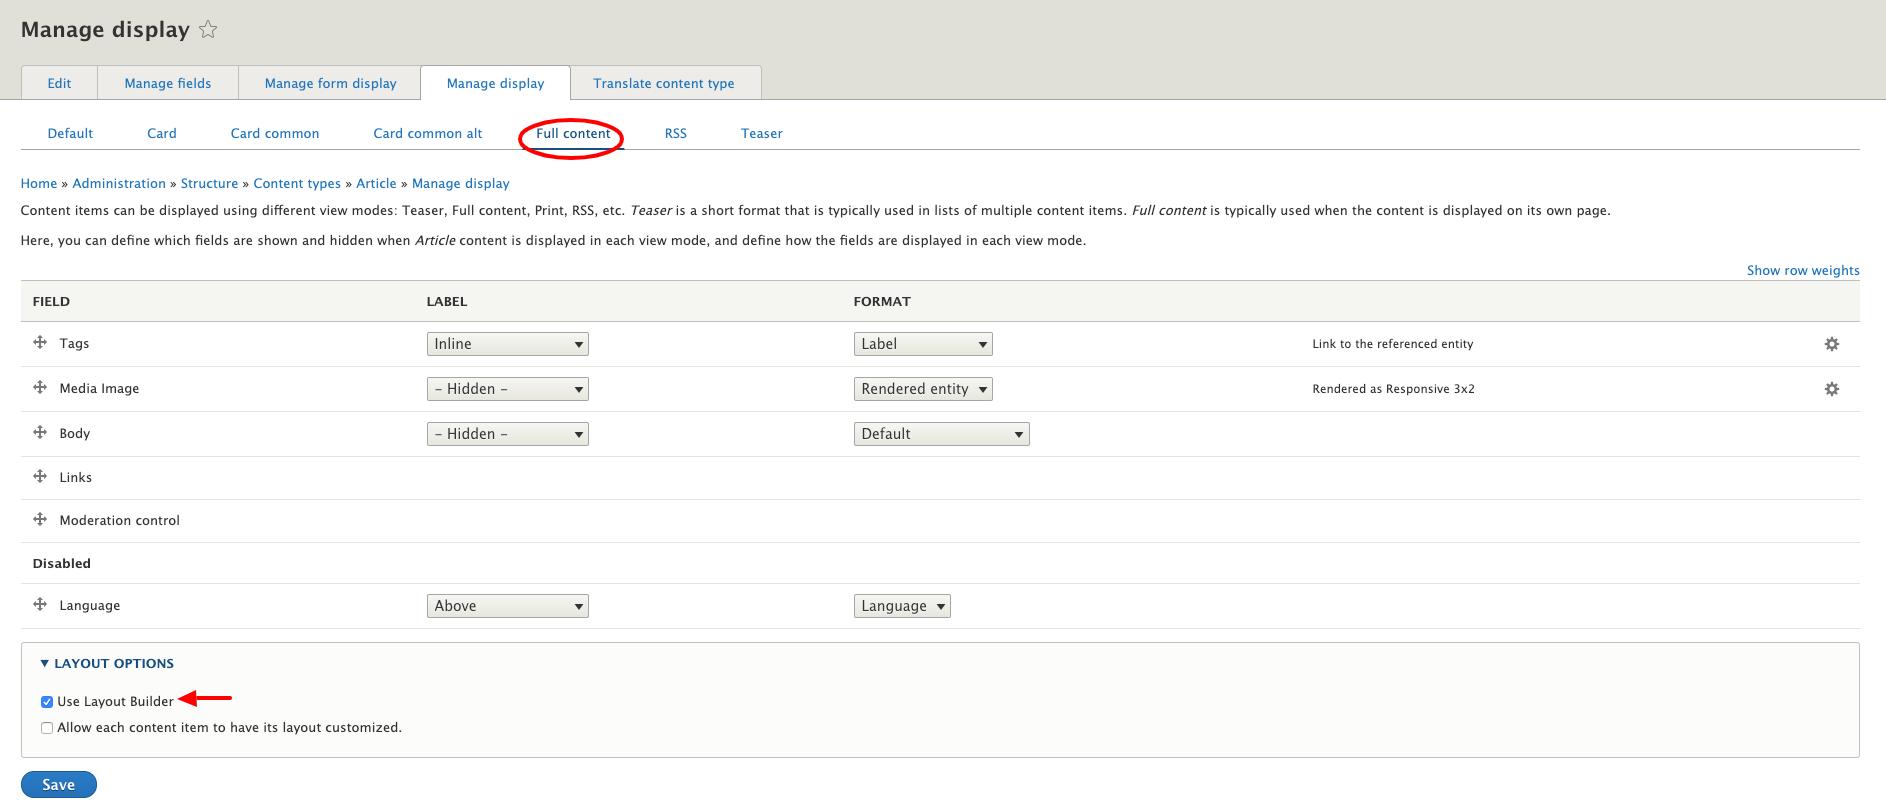 screenshot of layout builder in Drupal